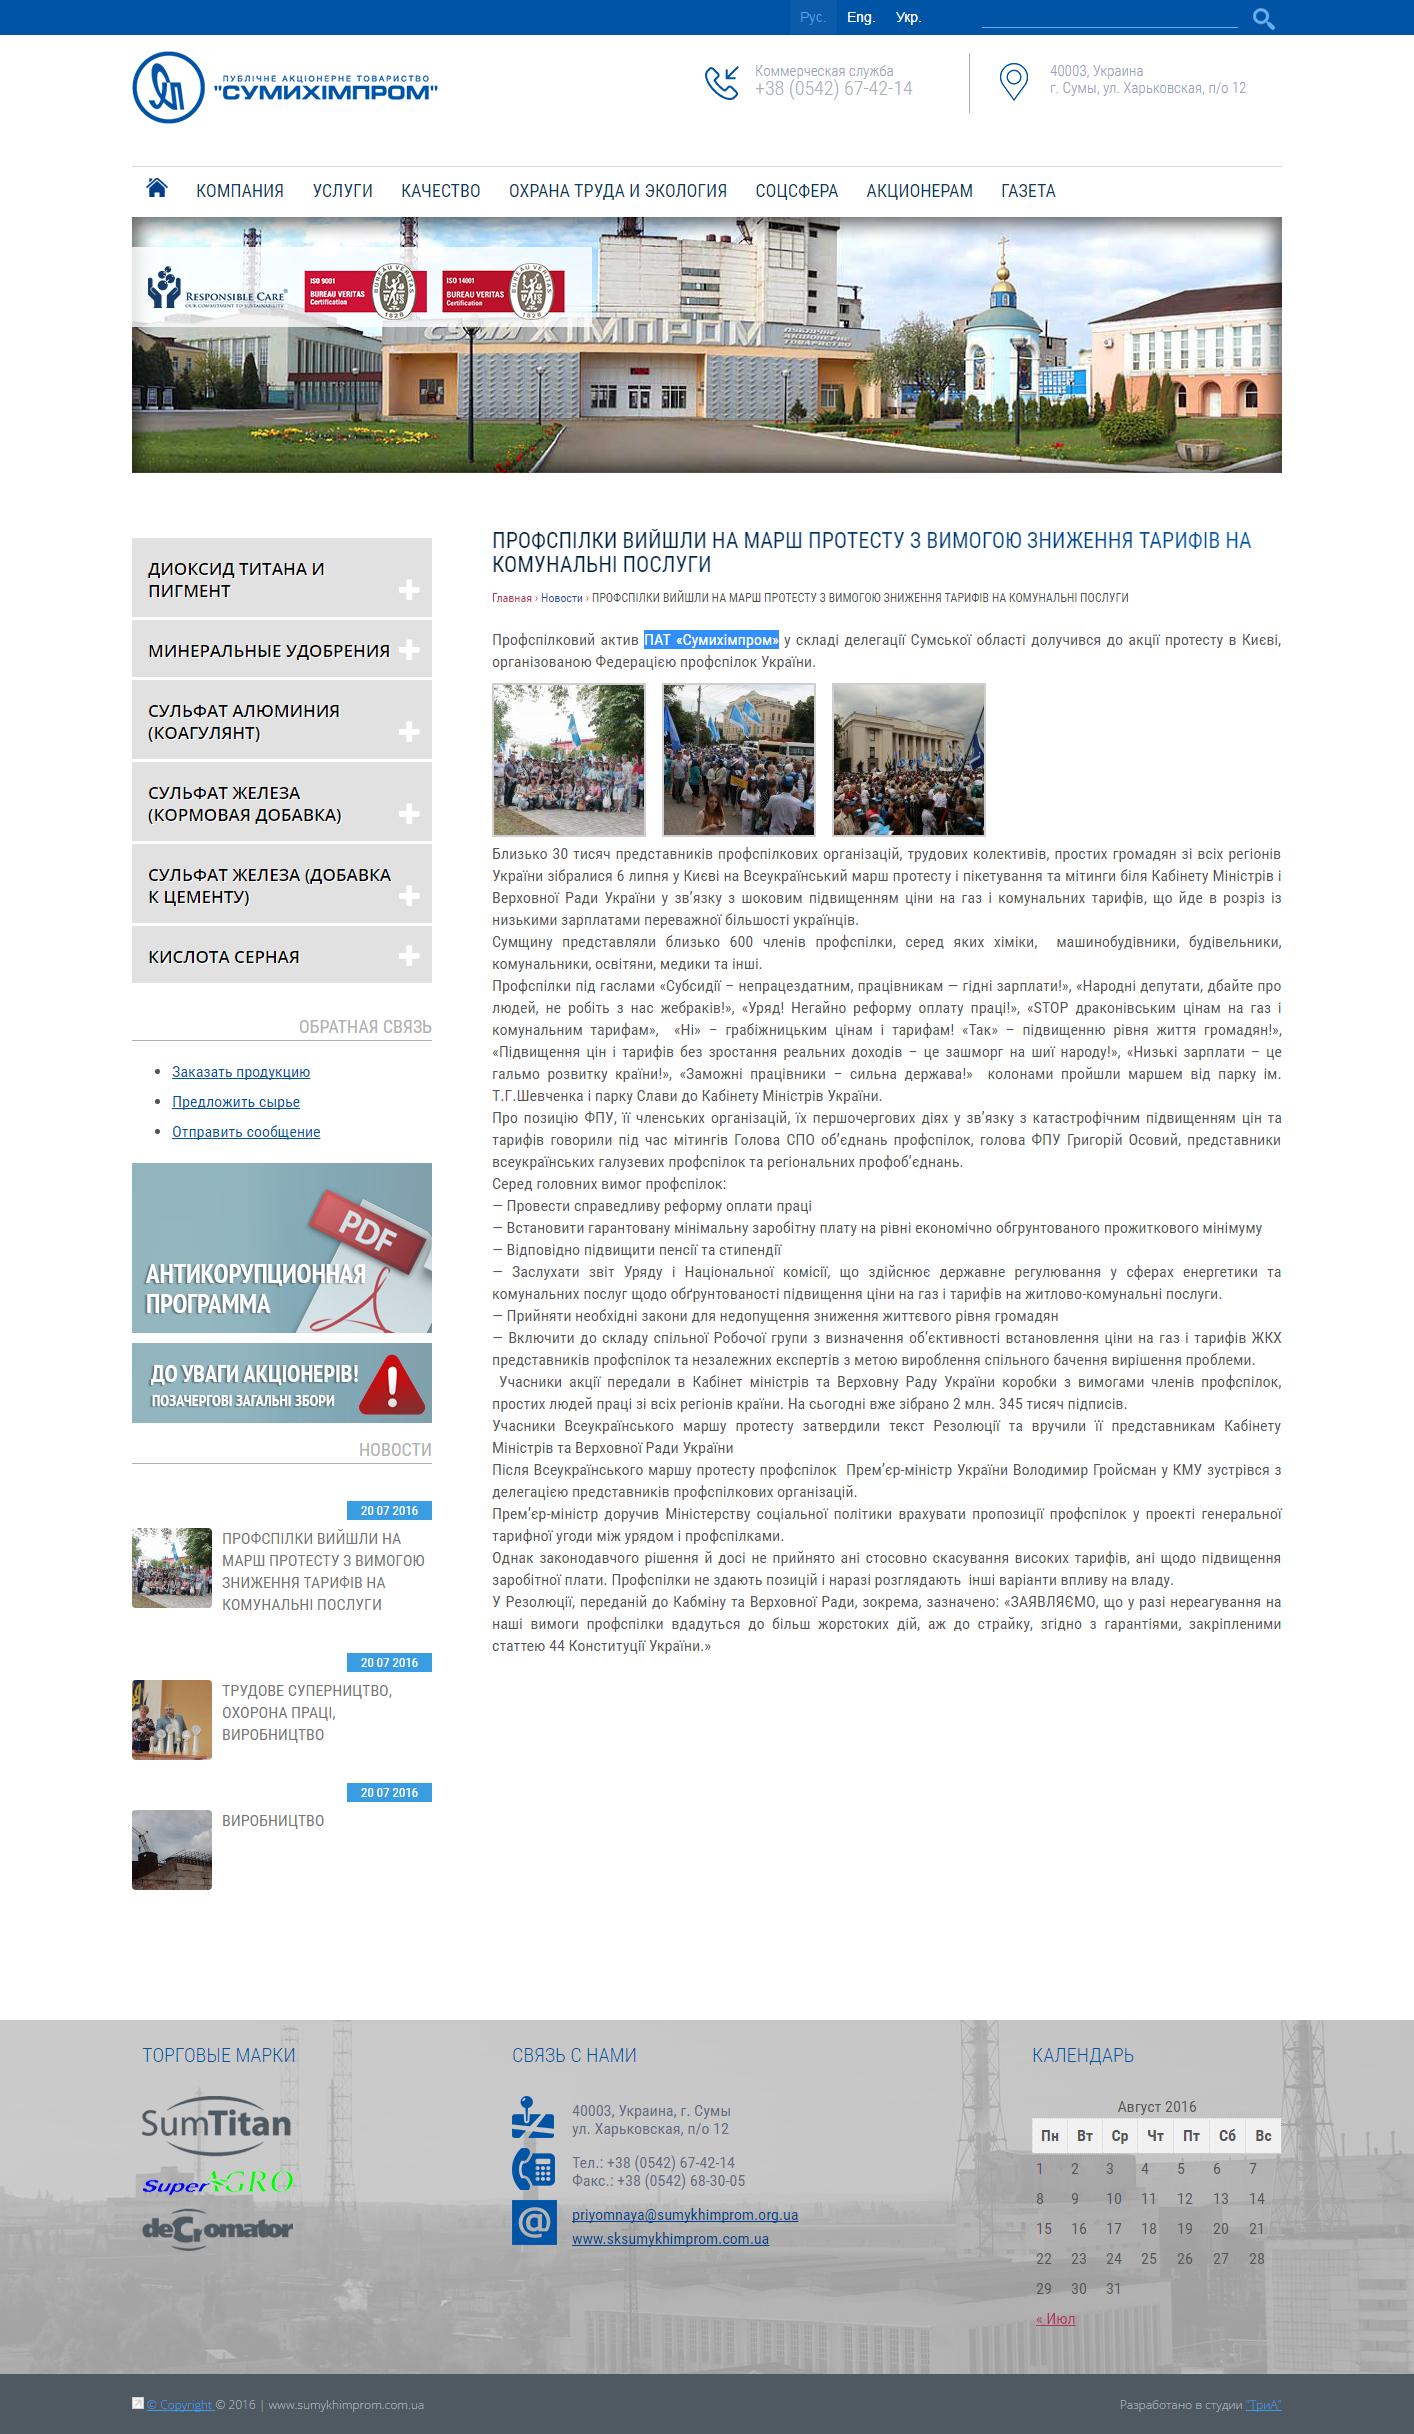 sumykhimprom.com.ua screen capture 2016-08-02_14-59-51